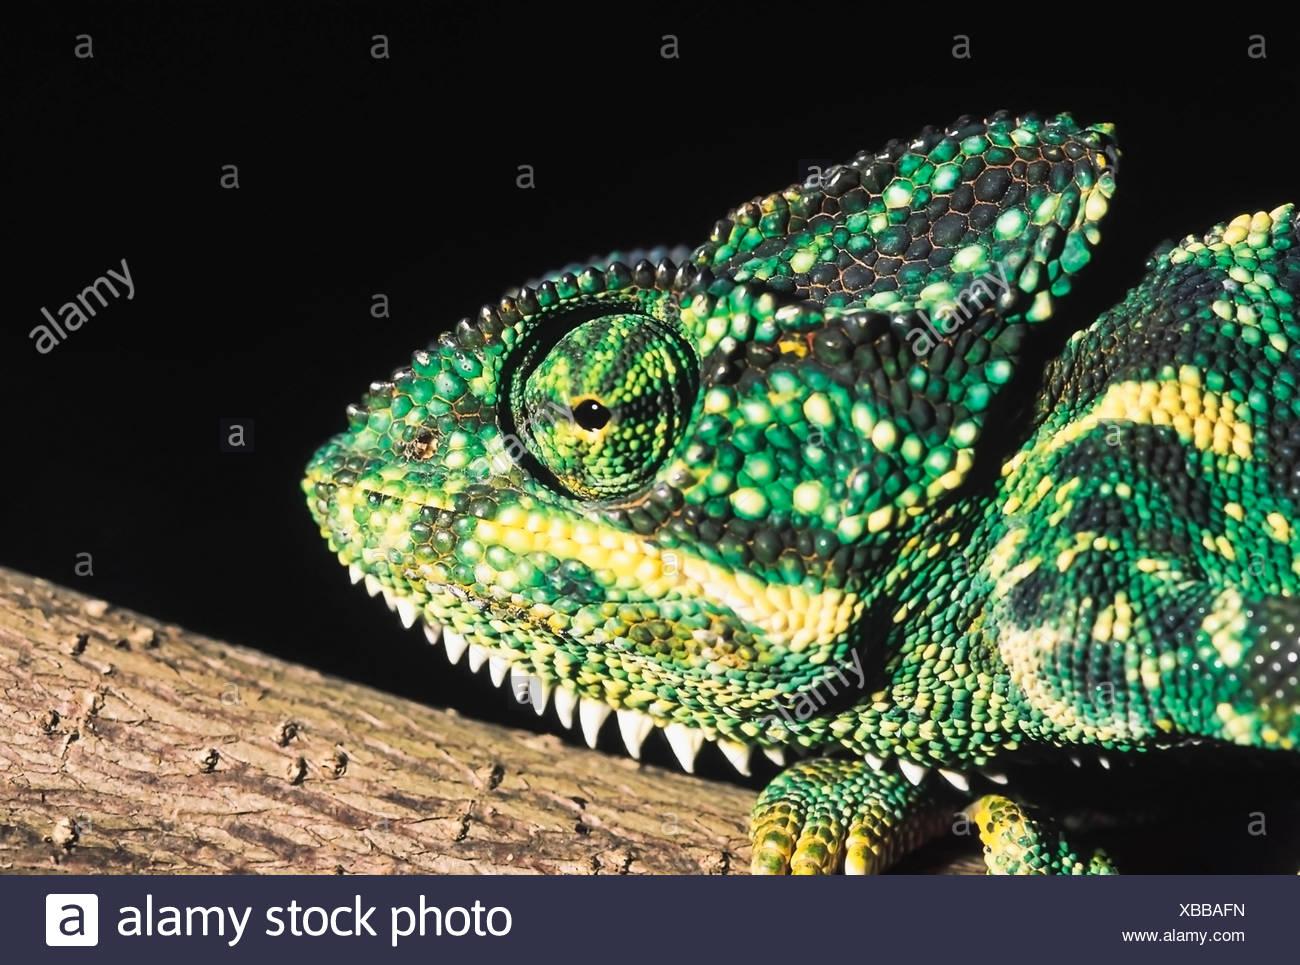 Camaleón Zeylanicus. Indian camaleón, Camaleón cabeza. En Maharashtra, India. Imagen De Stock